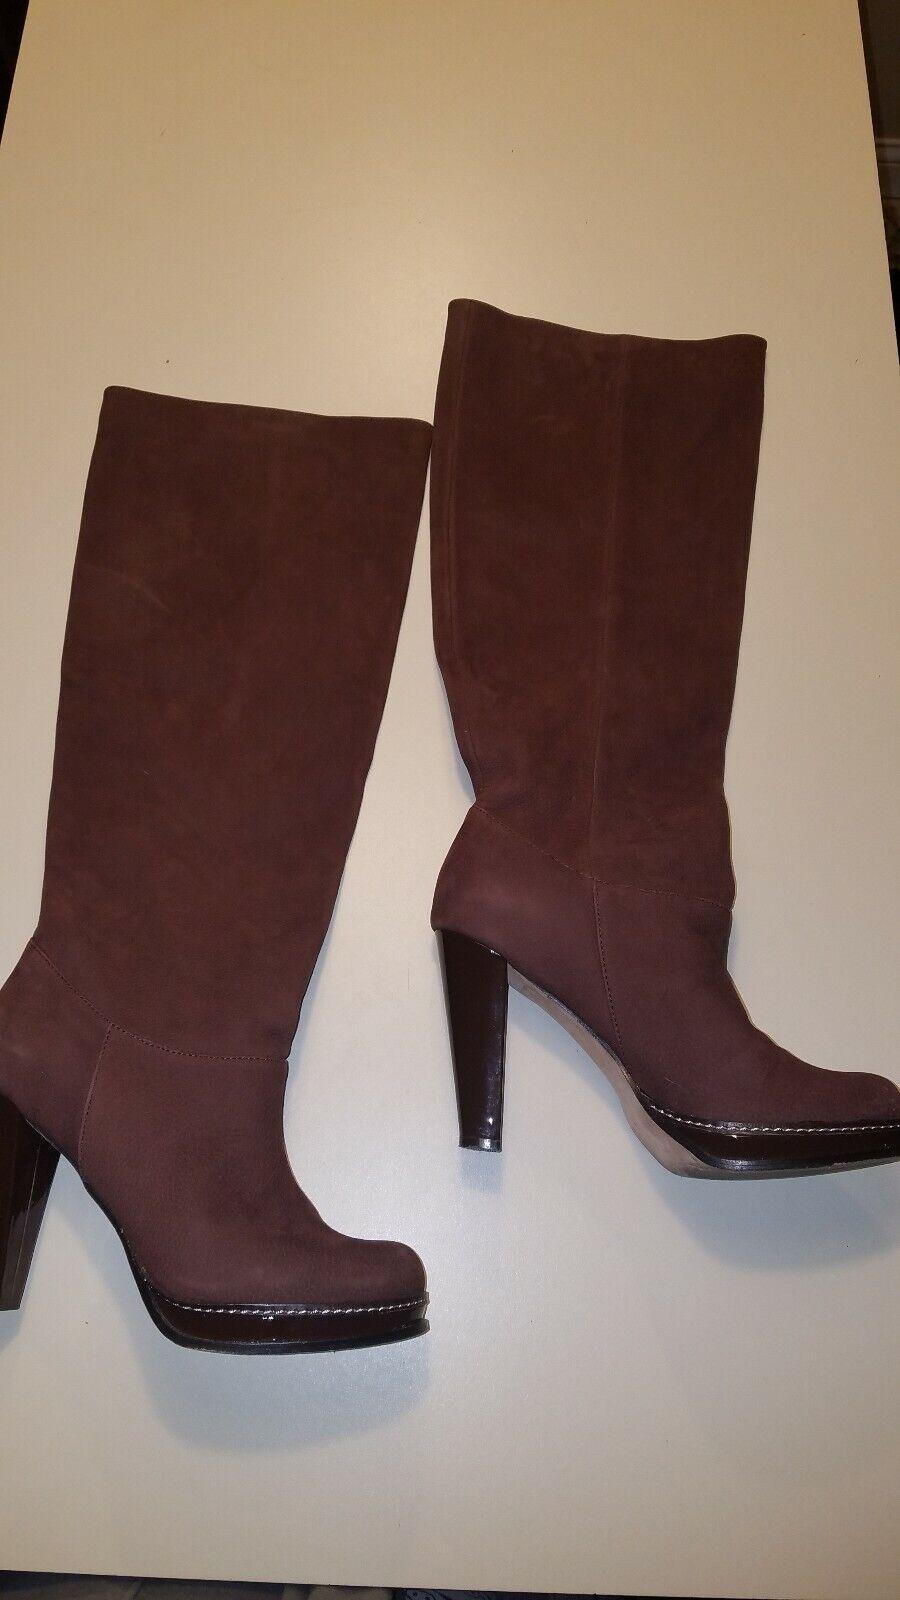 essere molto richiesto Cole Haan 9.5 B Nola Slouch Slouch Slouch High heel Tall stivali N ike Air Marrone Dimensione D38401  molto popolare